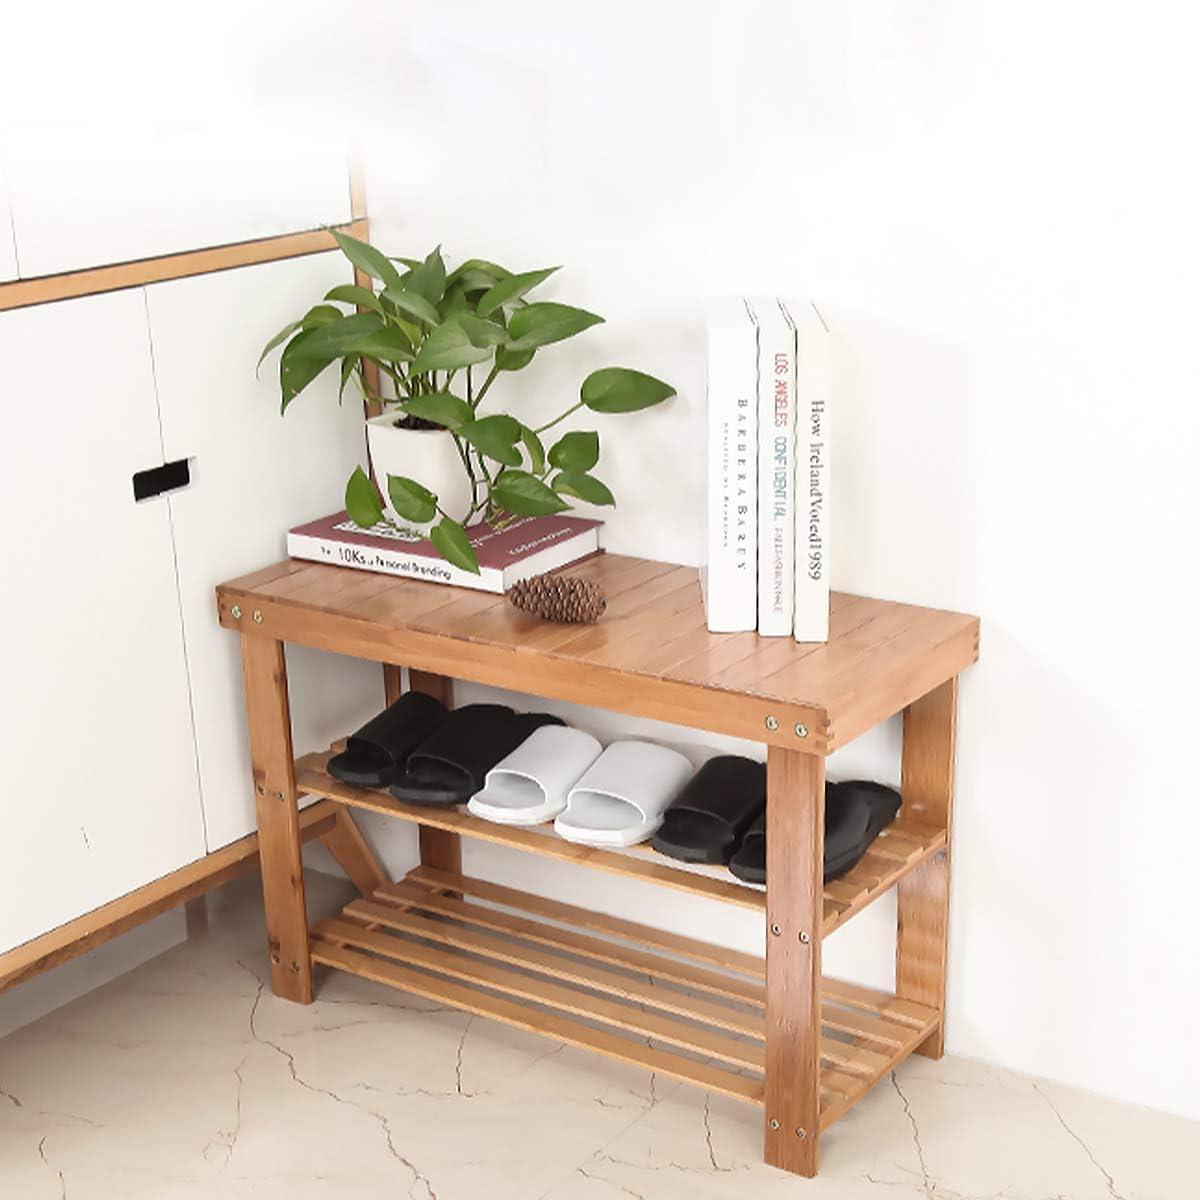 Shoe Rack Bench Natural Bamboo Shoe Organizer 3 Tier Shoe Shelf for Entryway Seat Storage Shelf Hallway Bathroom Living Room 27.5 L x 11.2 W x 17.9 H, Natural Color